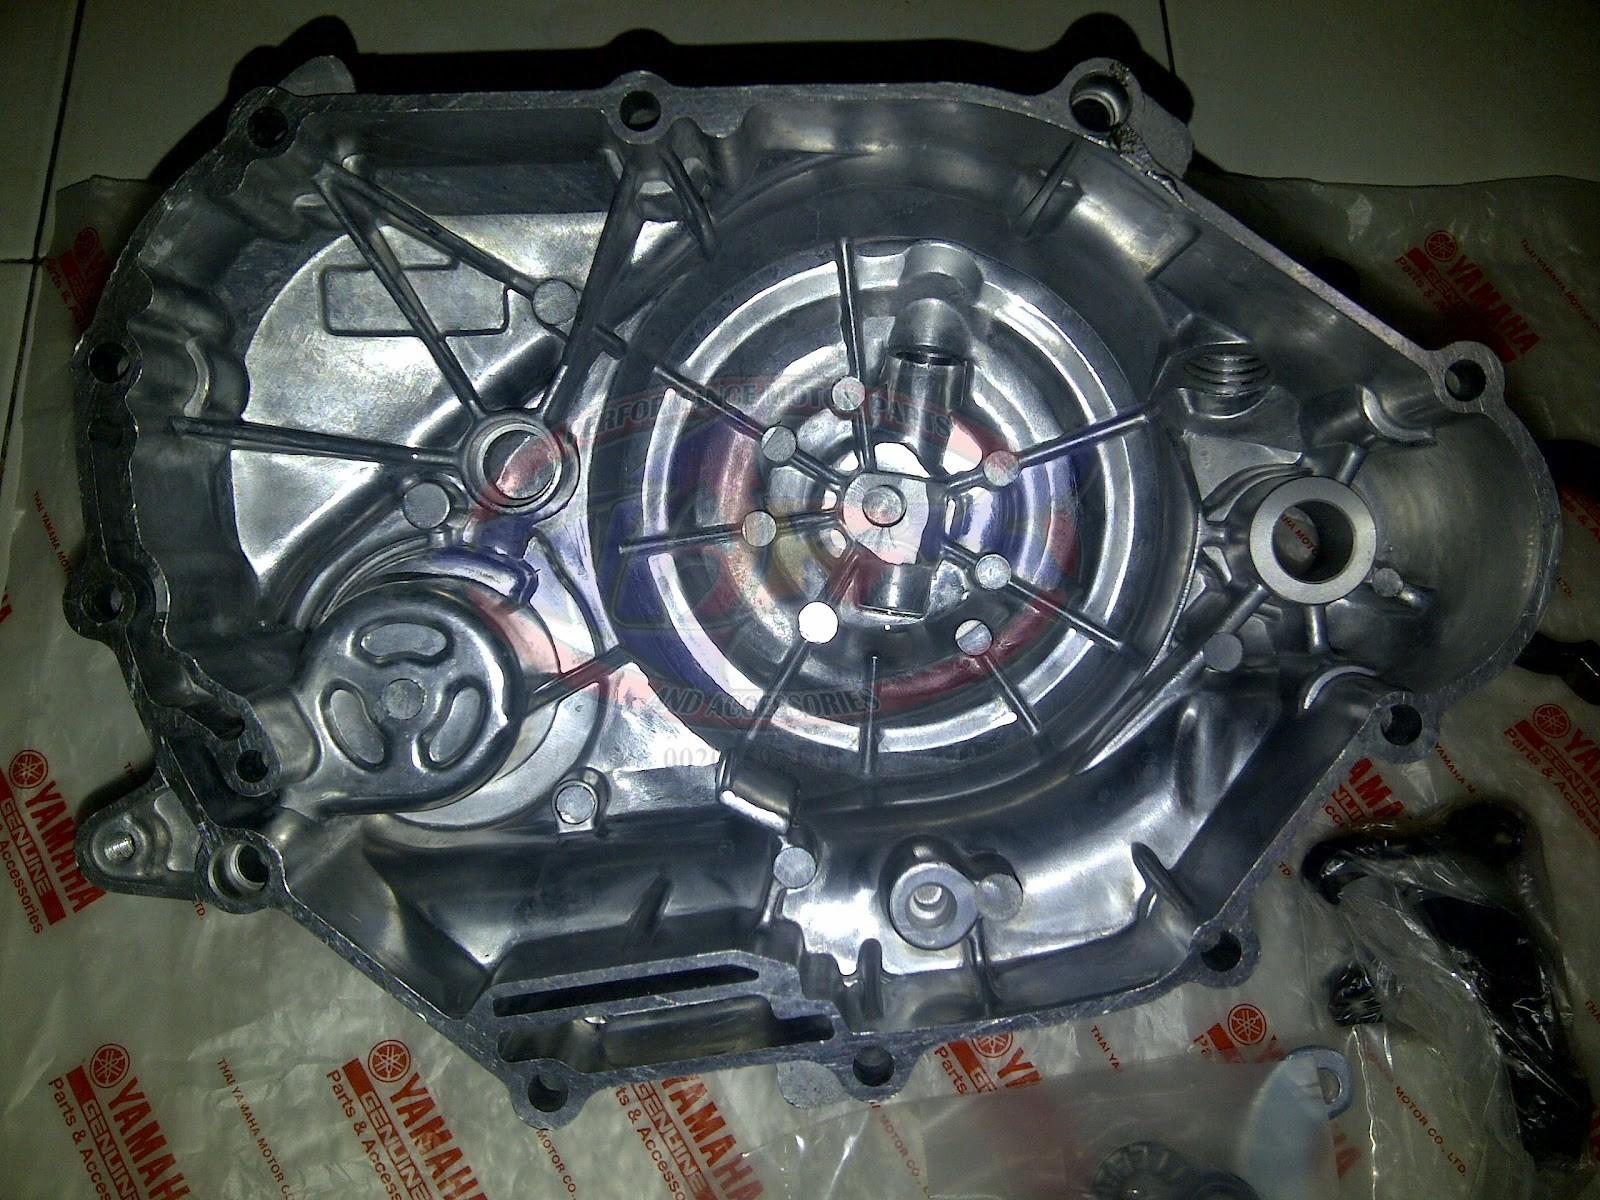 hight resolution of yamaha crypton r engine diagram syark performance motor parts and accessories line shop est of yamaha